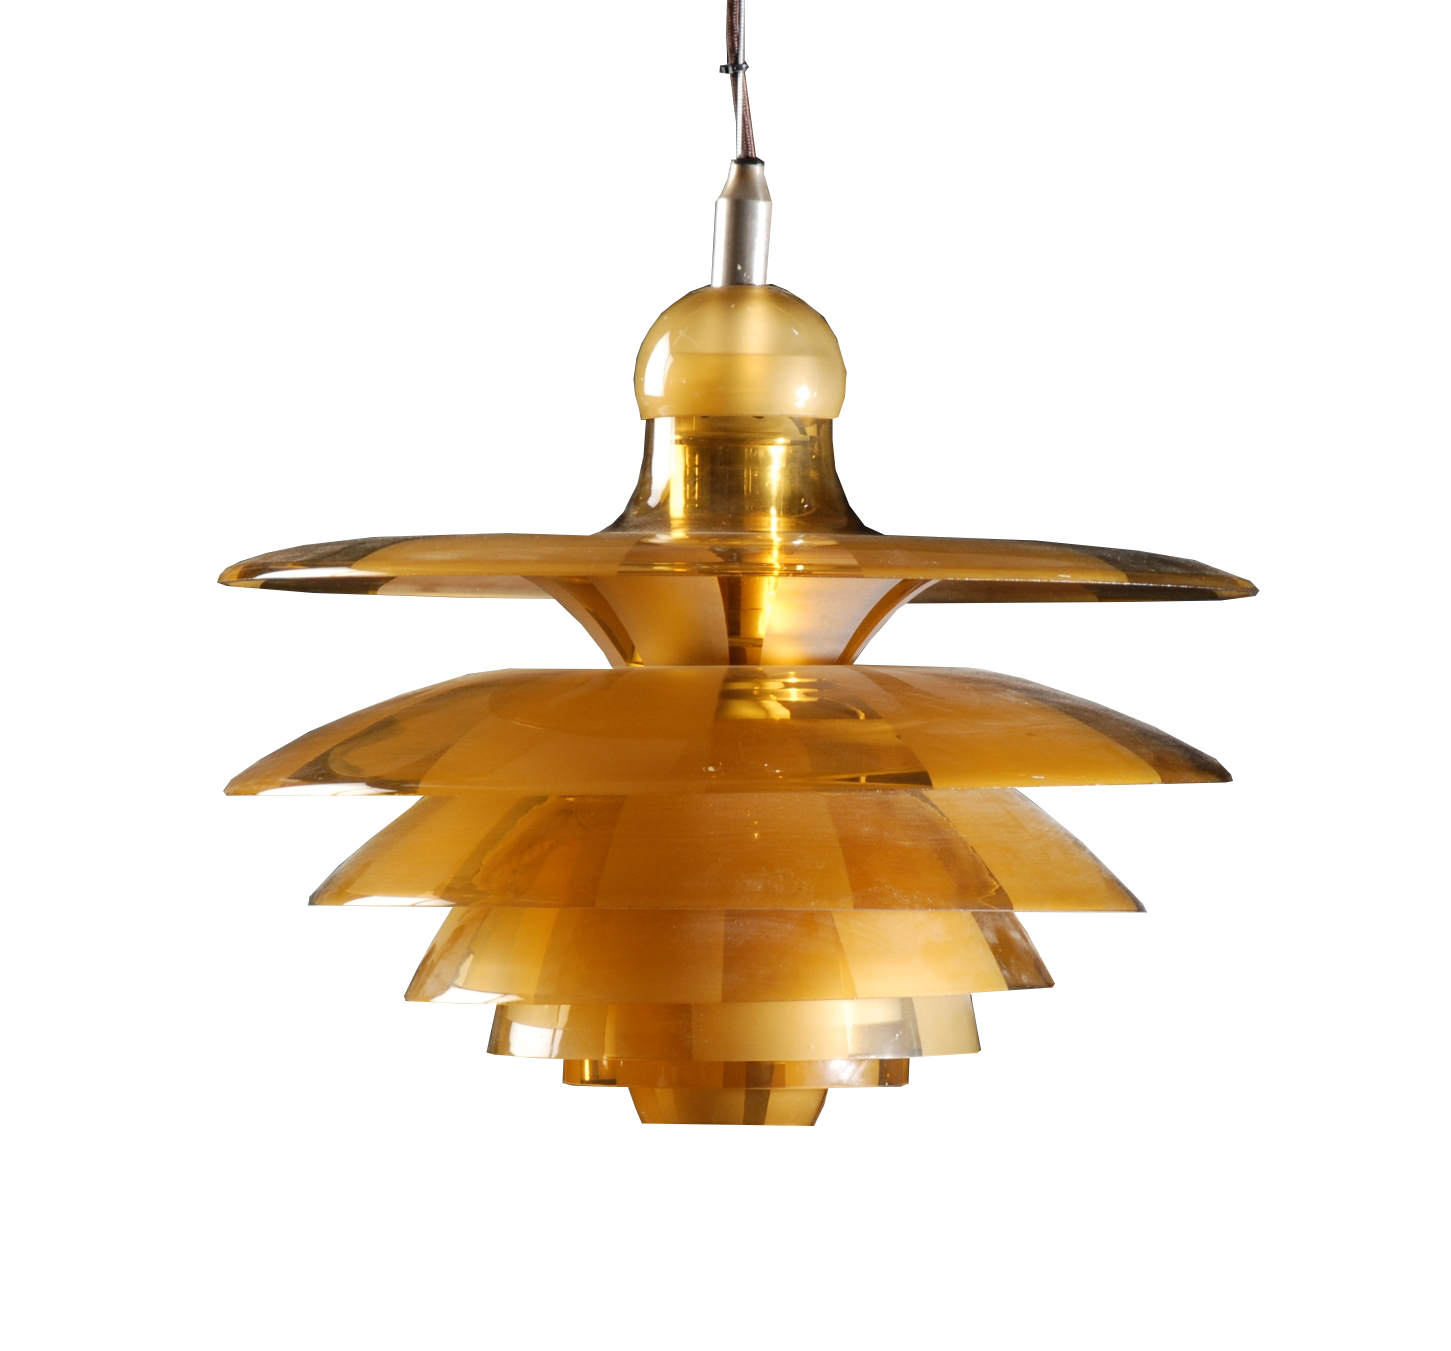 light up the dark what lamp lights your fancy lauritzblog international. Black Bedroom Furniture Sets. Home Design Ideas